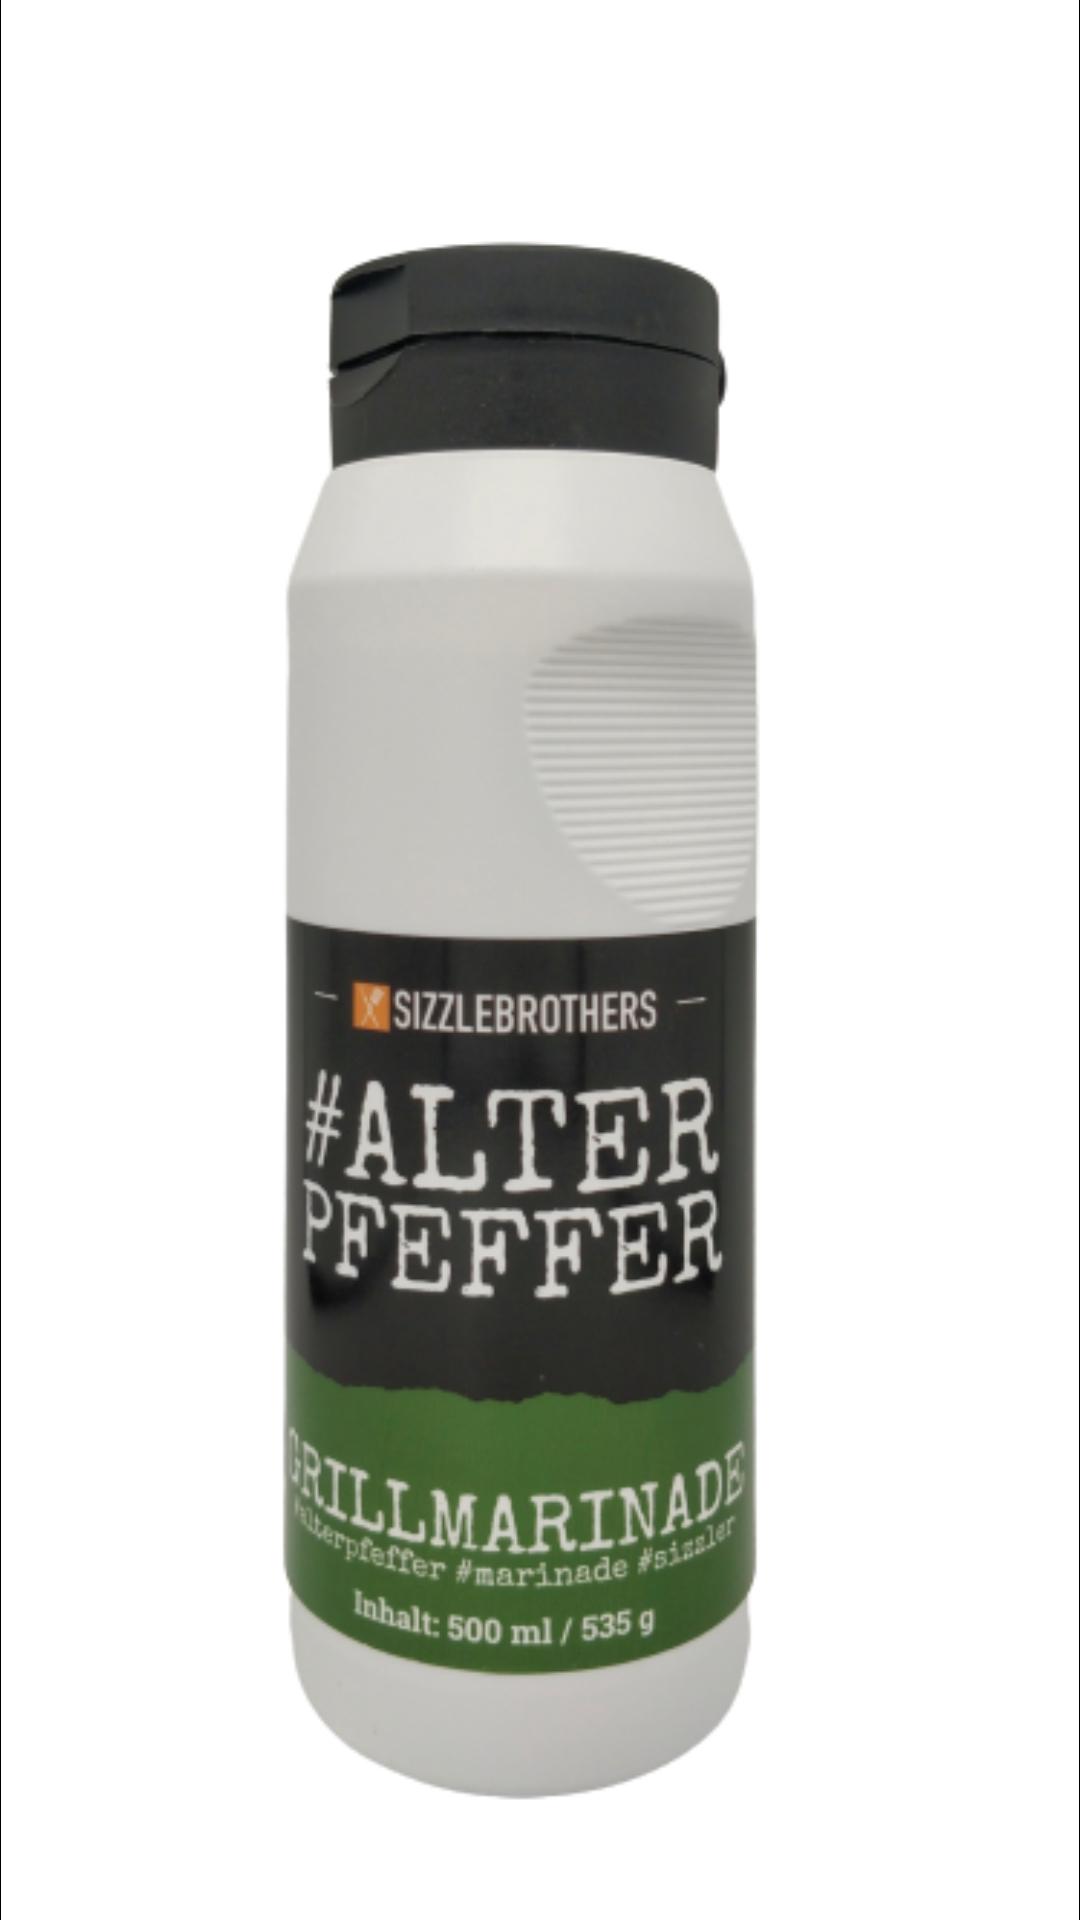 SizzleBrothers Alter Pfeffer Grillmarinade 500 ml